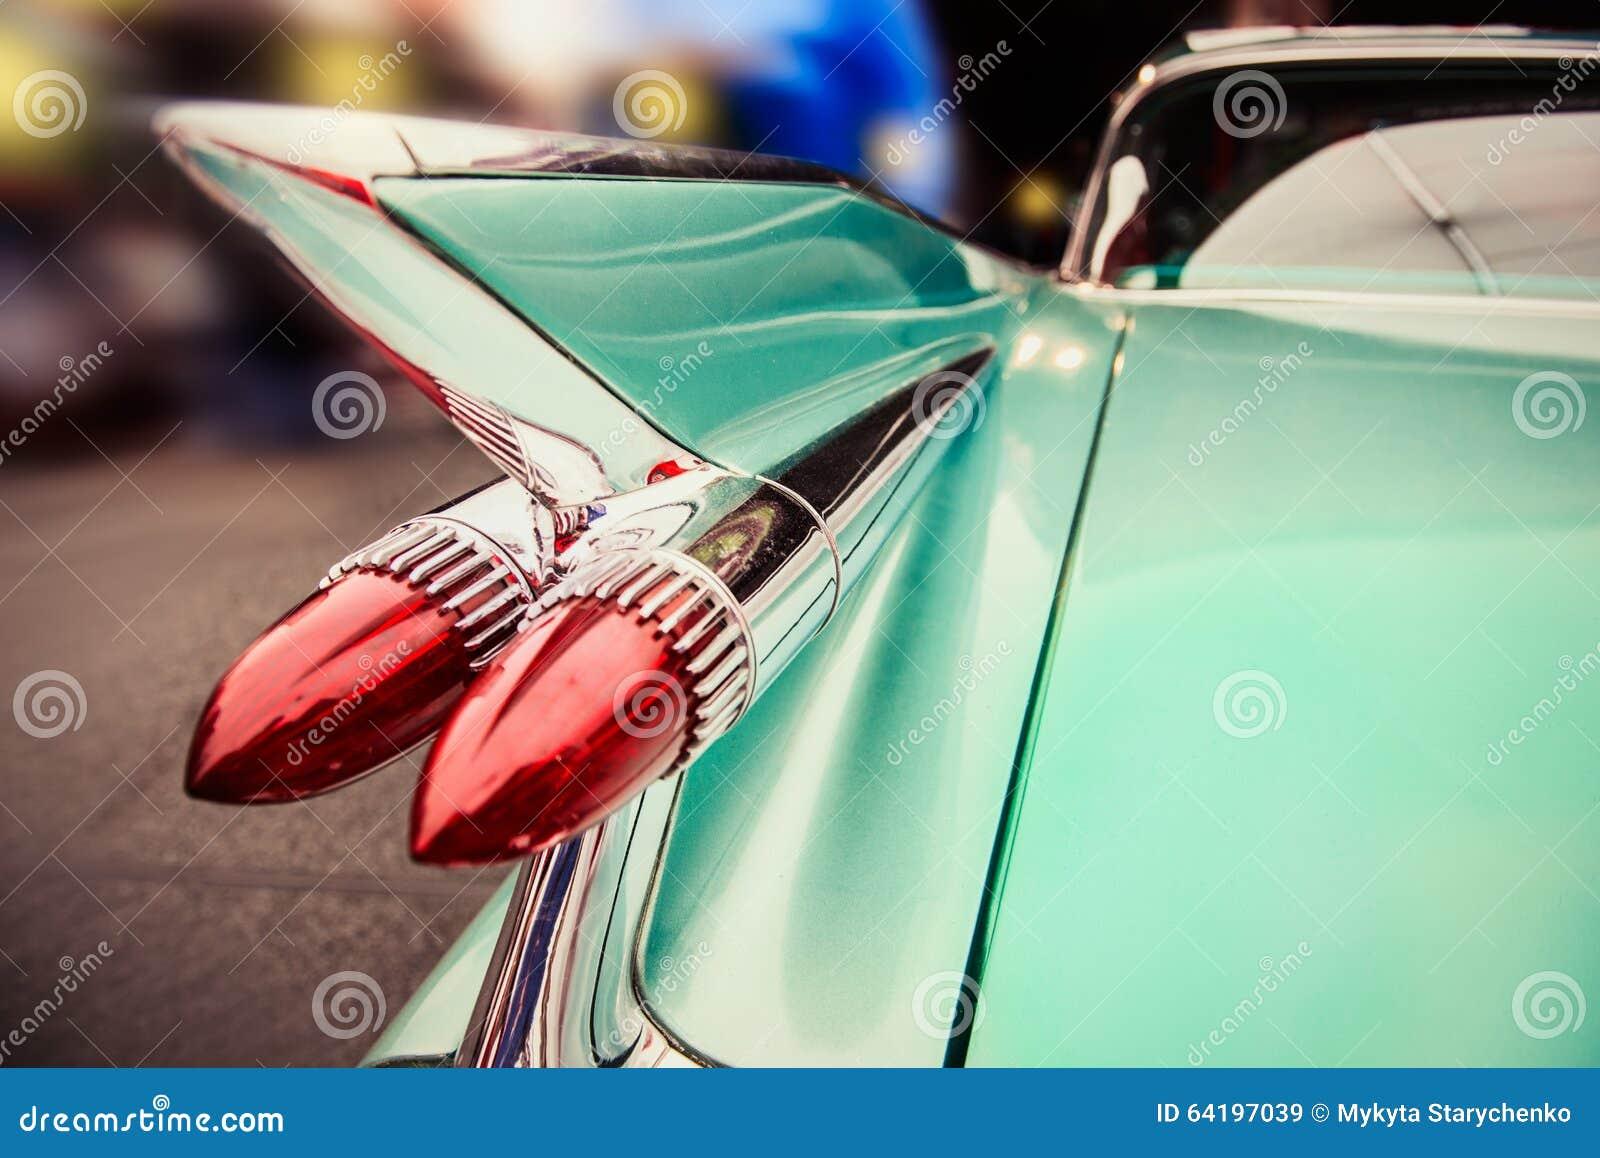 Luxury retro car driving in Las Vegas night city street